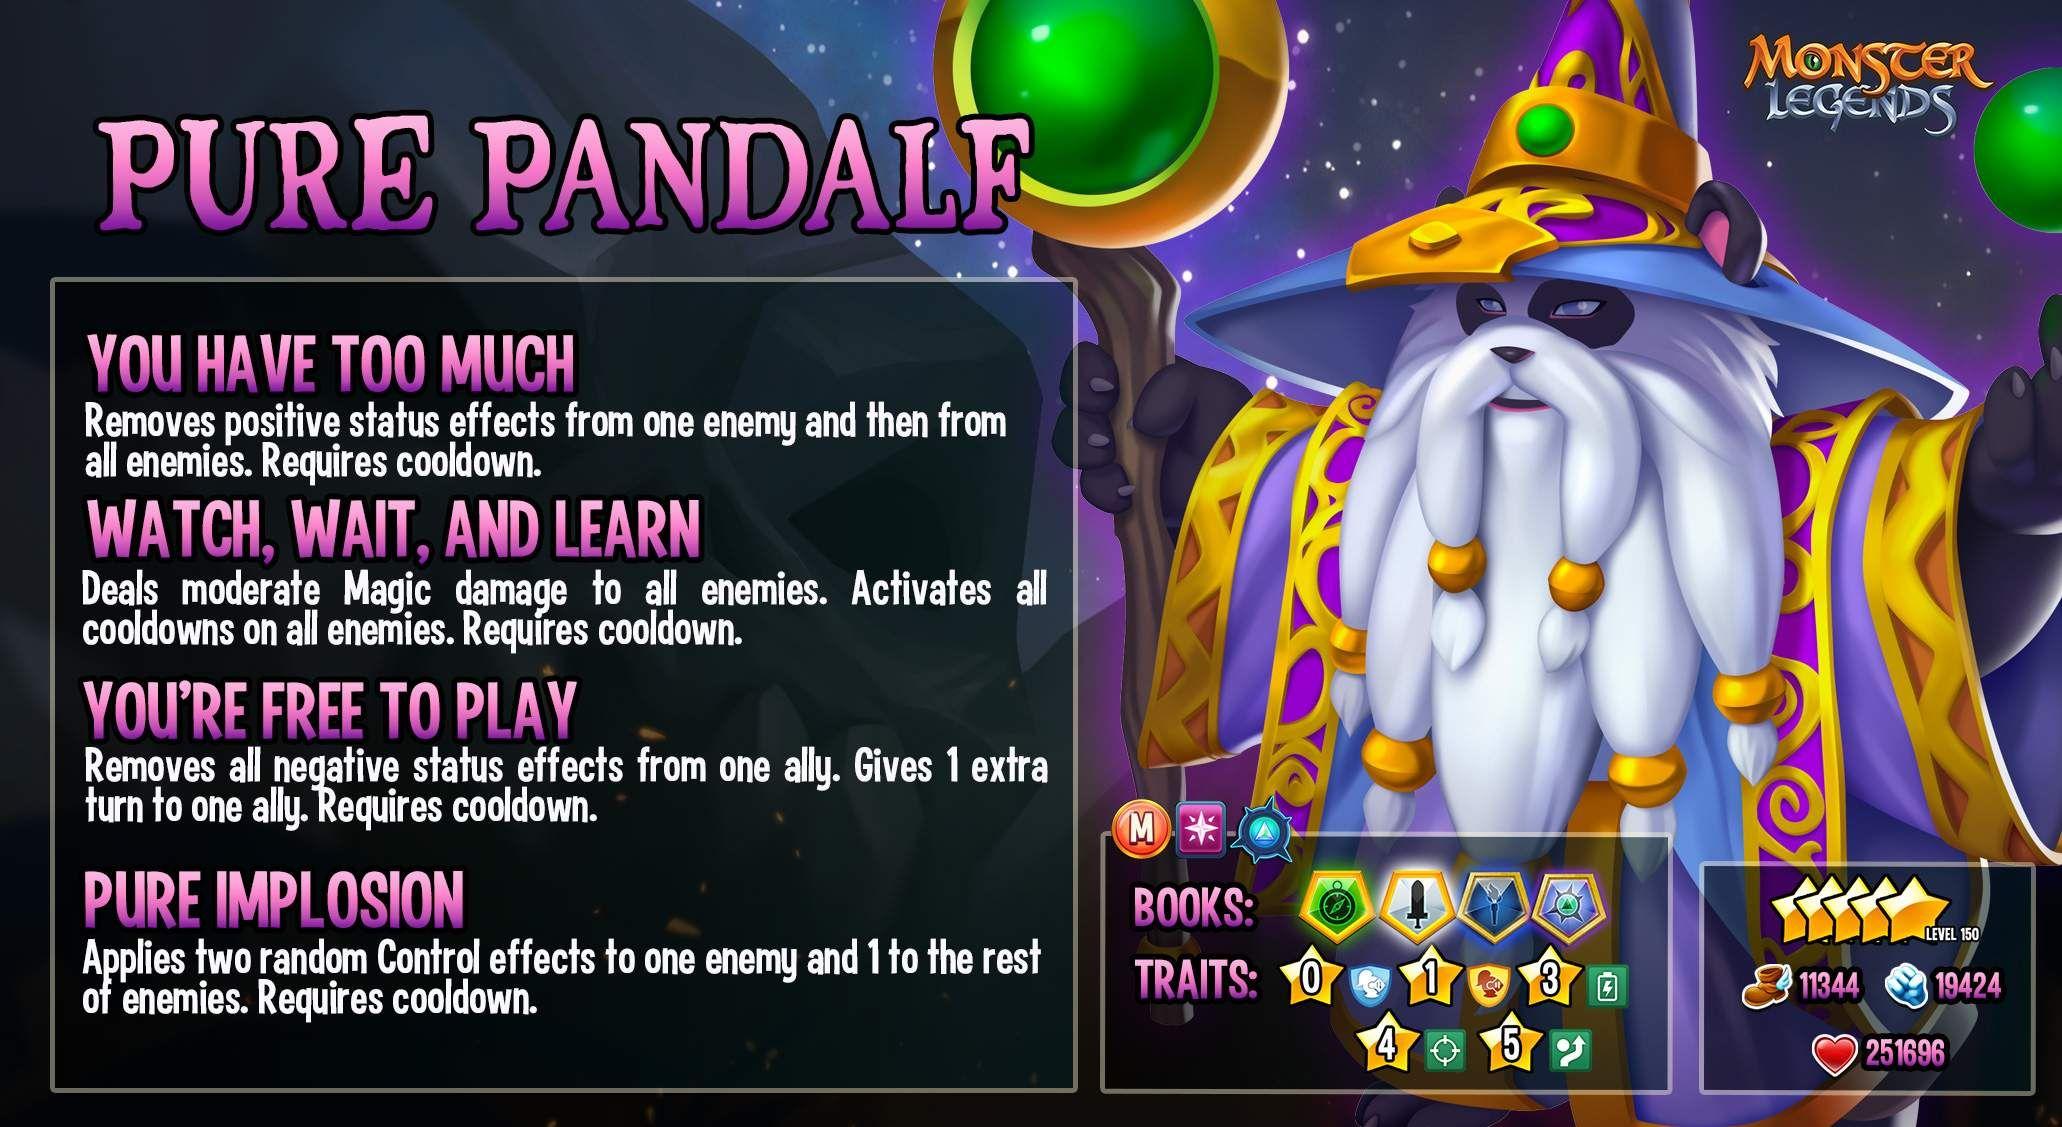 0_1624373431436_Pure-Pandalf.jpg